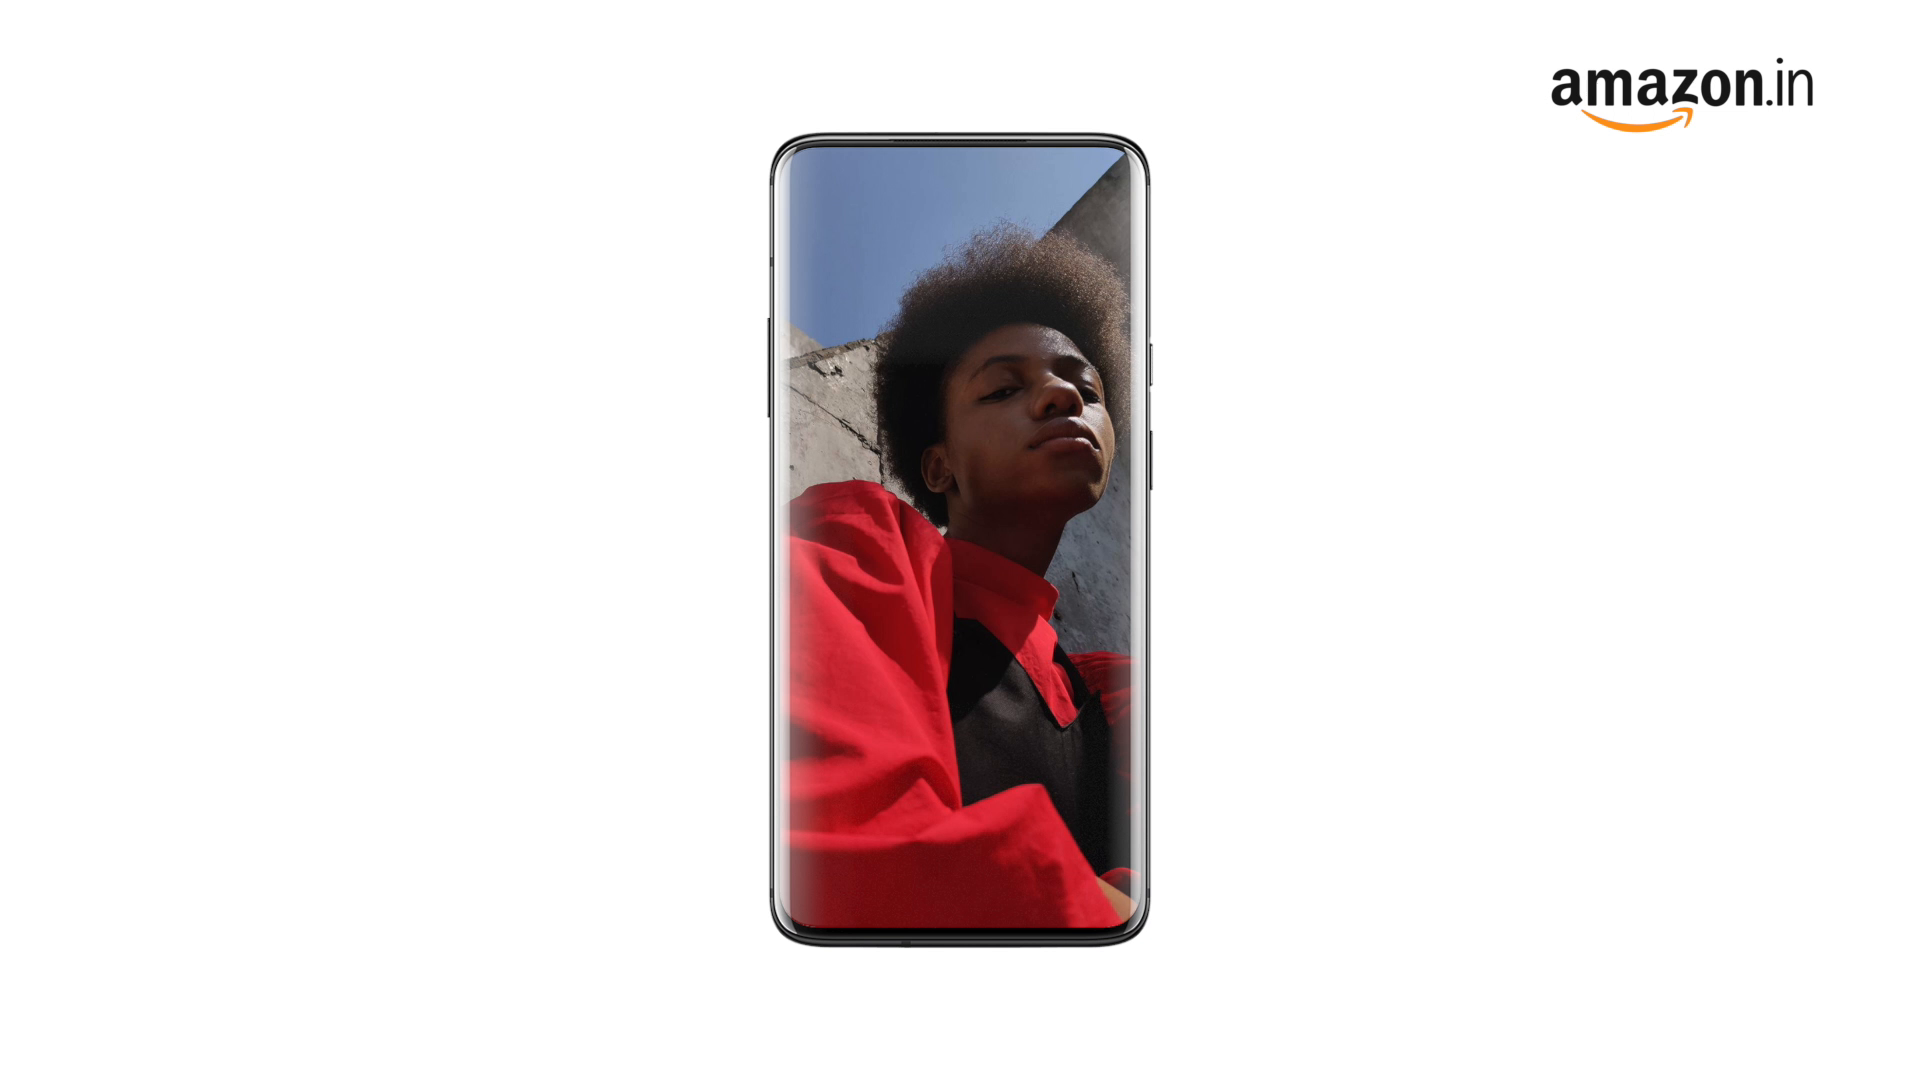 OnePlus 7  Pro (Mirror Grey, 6GB RAM, Fluid AMOLED Display, 128GB Storage, 4000mAH Battery)